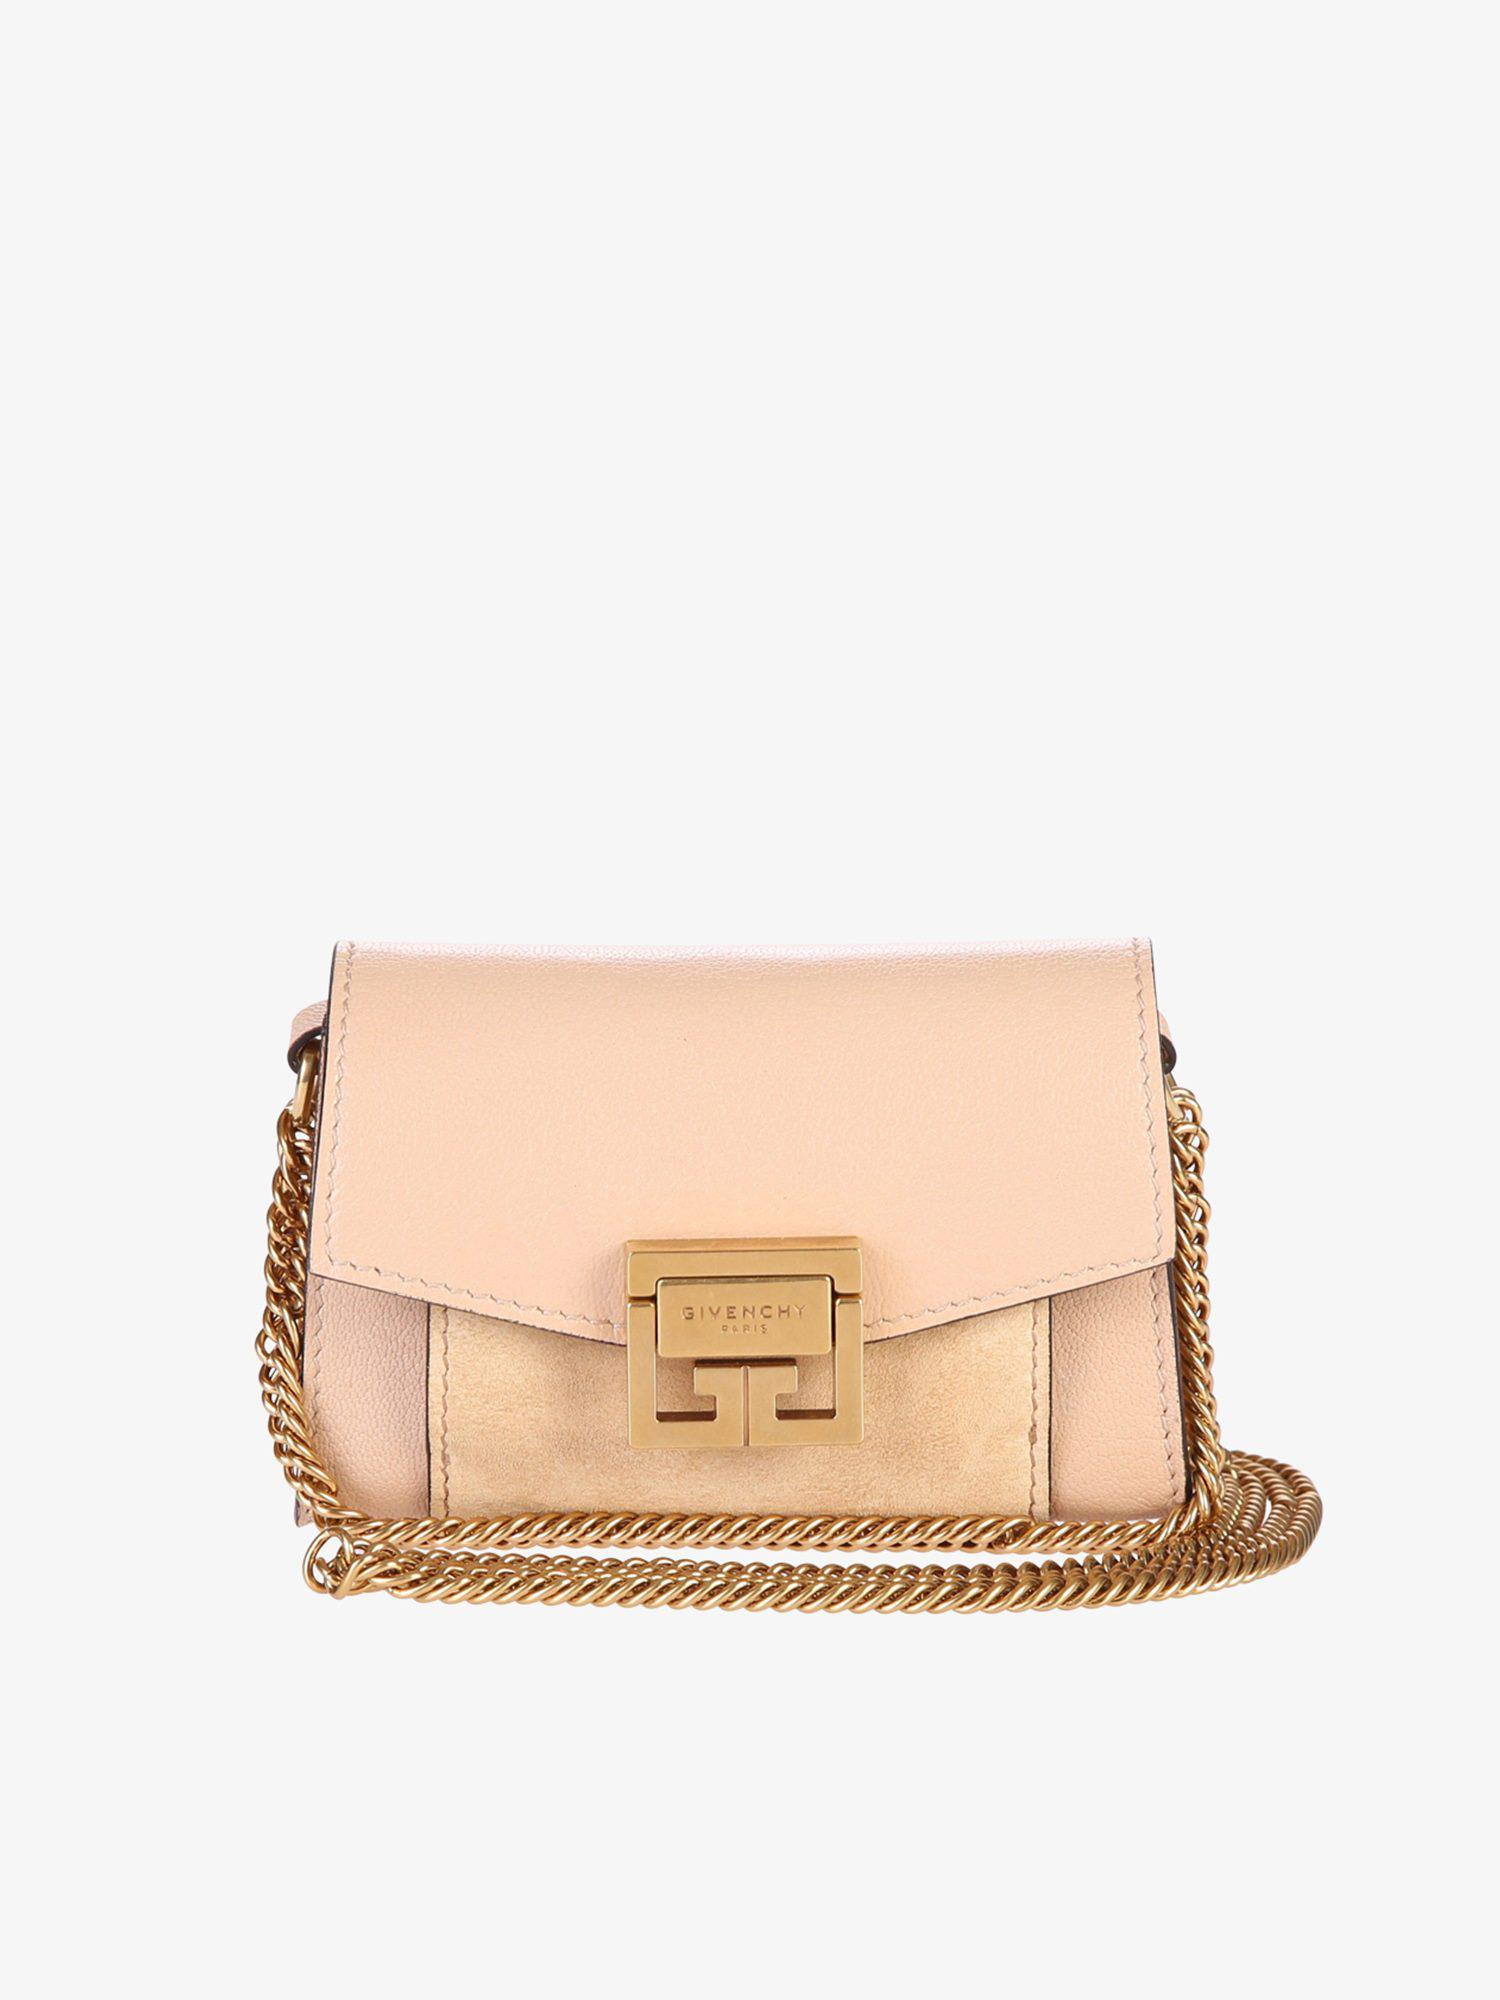 0a9fcf97a3eb Lyst - Givenchy Nano Gv3 Leather Bag